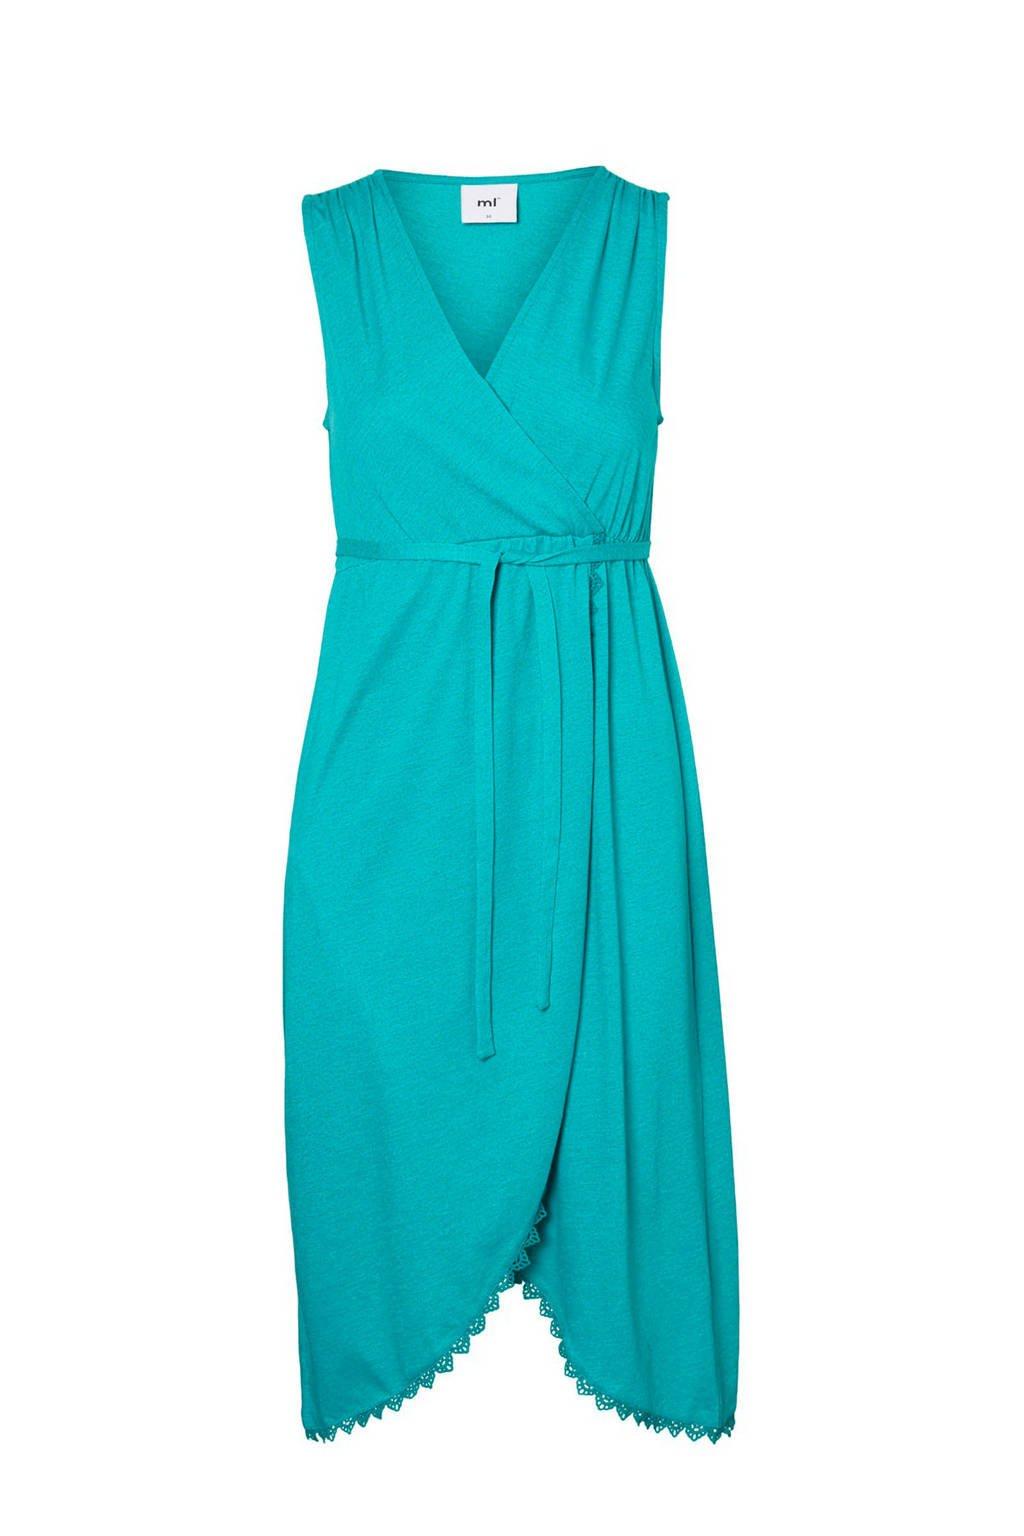 MAMA-LICIOUS zwangerschaps- en voedingsjurk Blaire turquoise, Turquoise